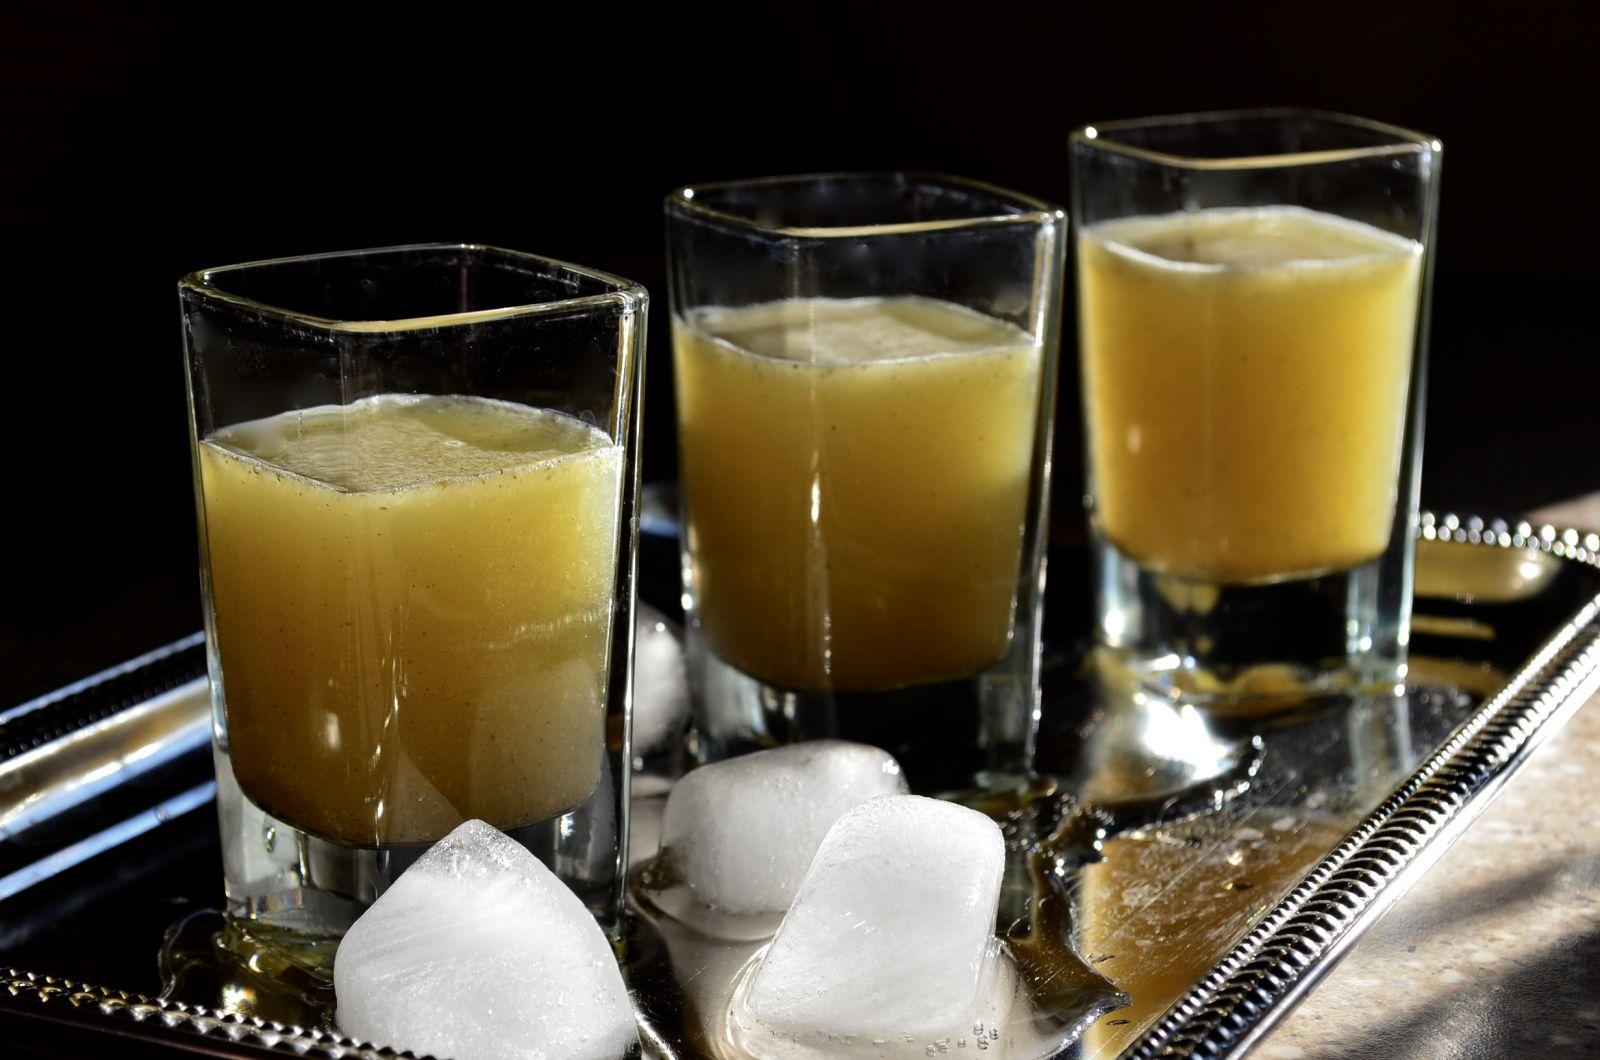 Pineapple Jal Jeera Recipe – Sweet & Sour Pineapple Drink